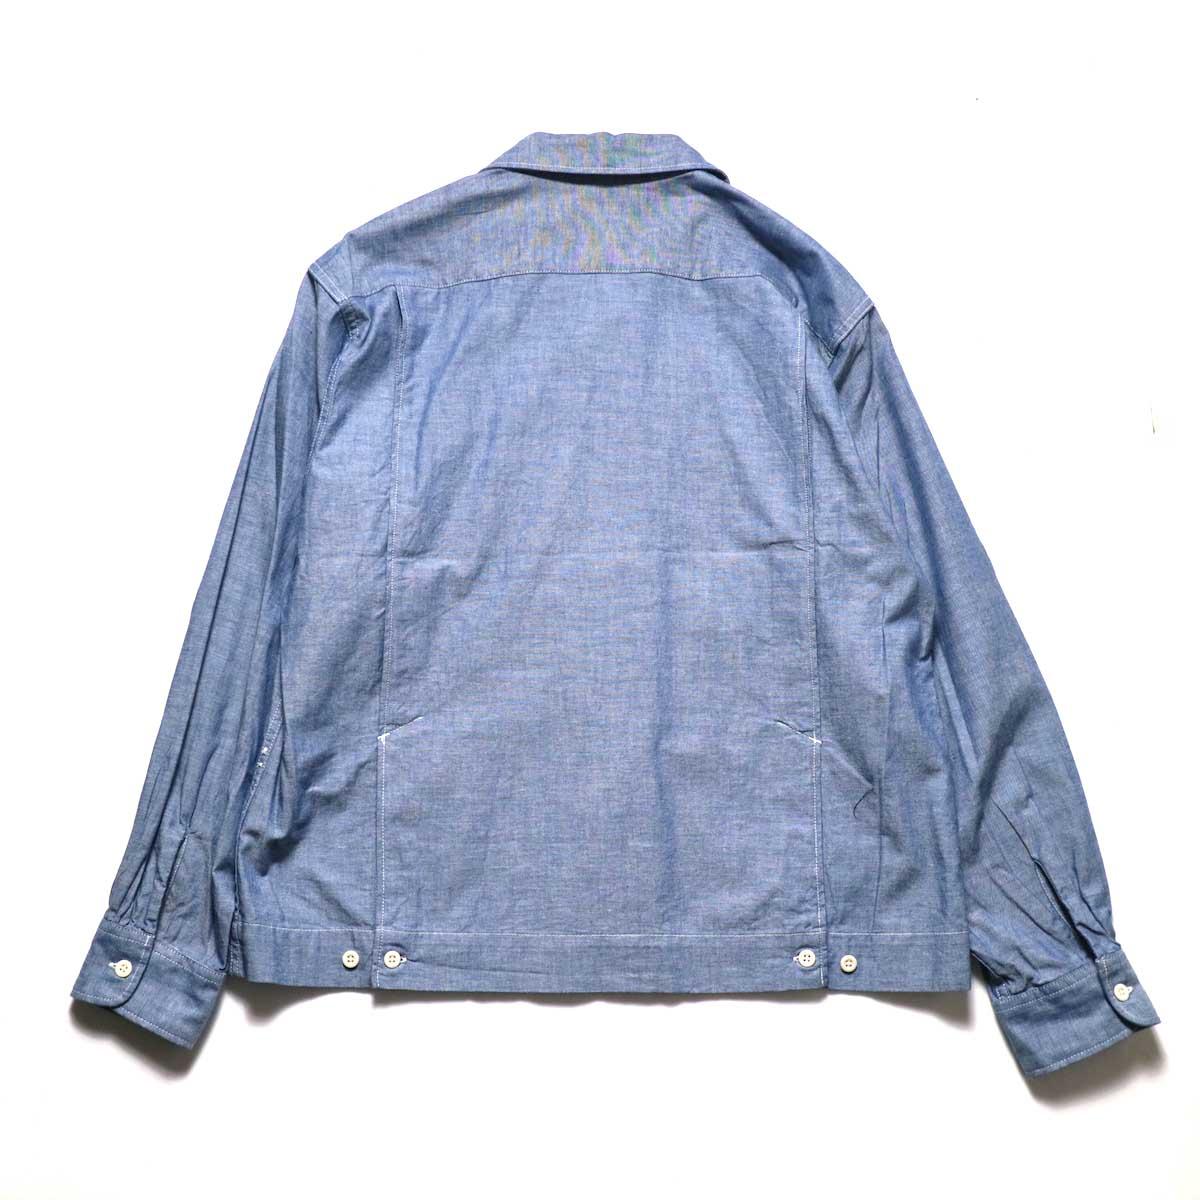 Engineered Garments / Bowling Shirt-Cotton Chambray (Blue)背面